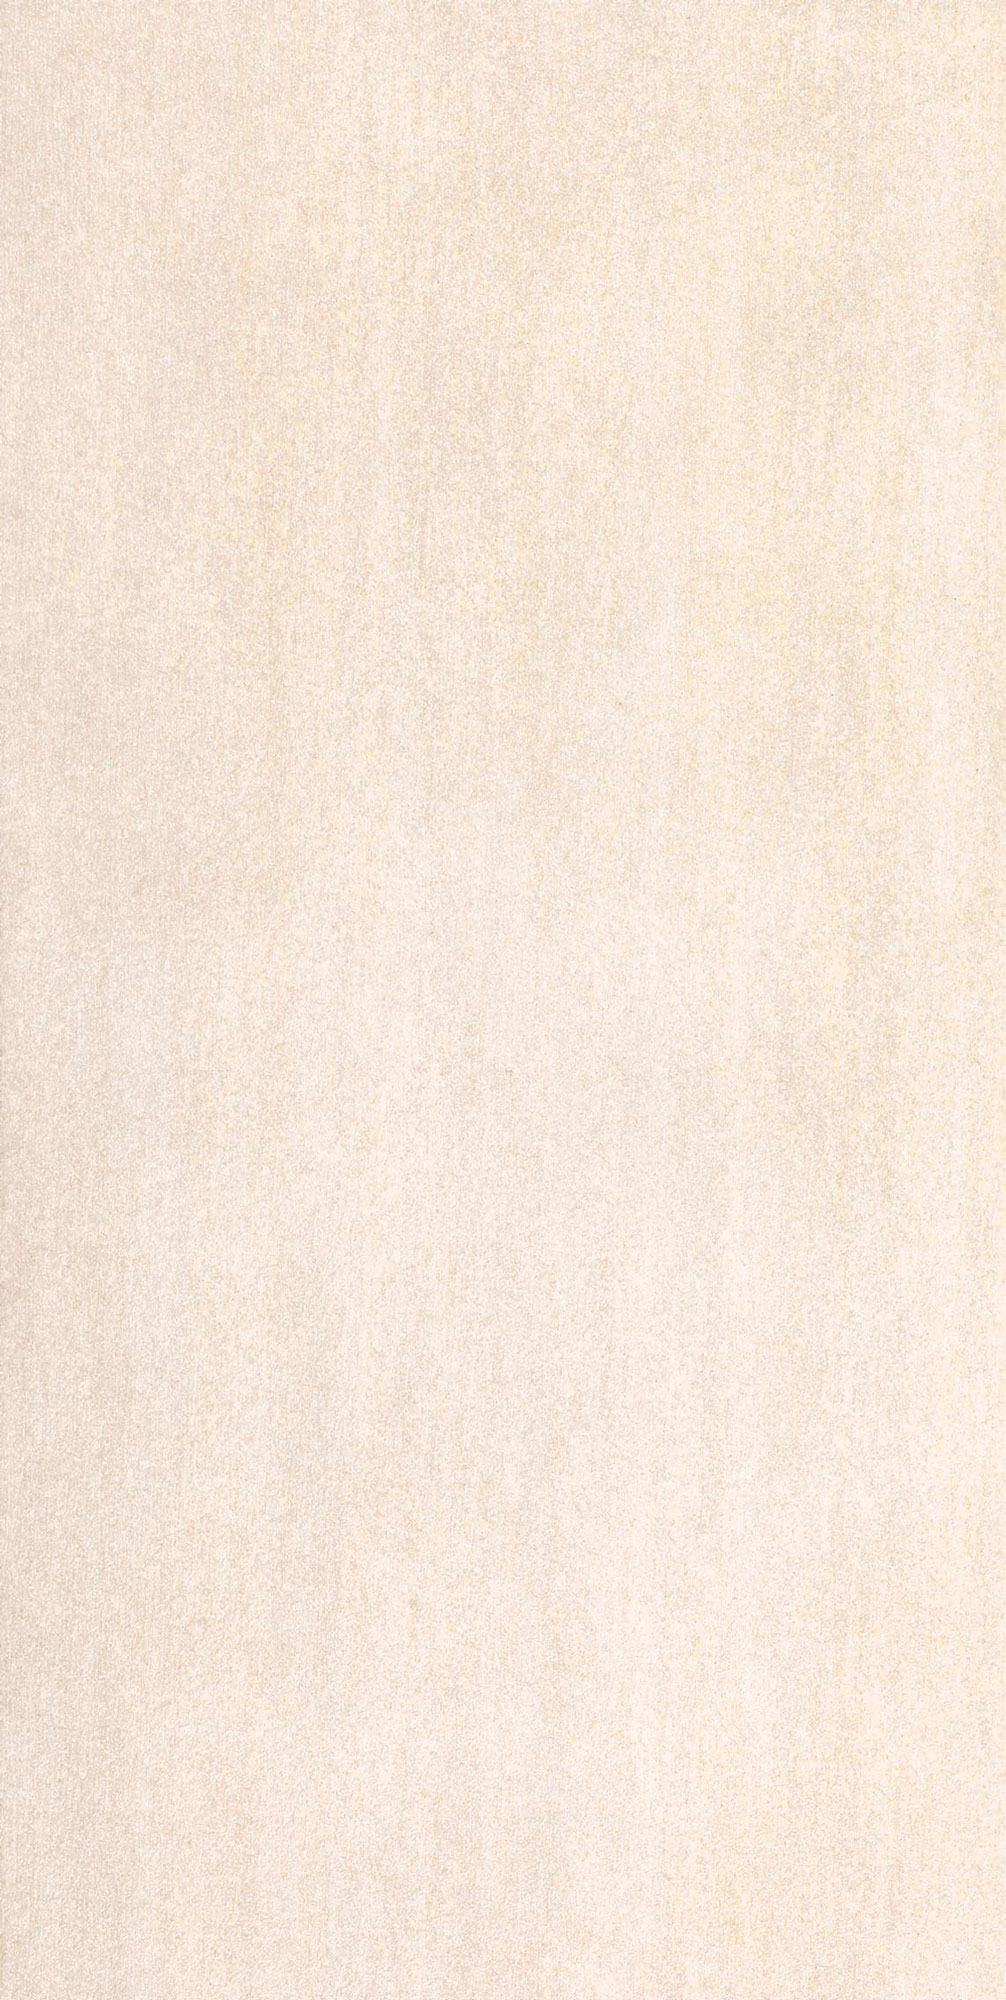 Напольная плитка Ceramika Konskie Quarzite Bianca Rekt Lap 42x84 (1,41) напольная плитка ceramika konskie quarzite bianca rekt lap 60x60 1 44